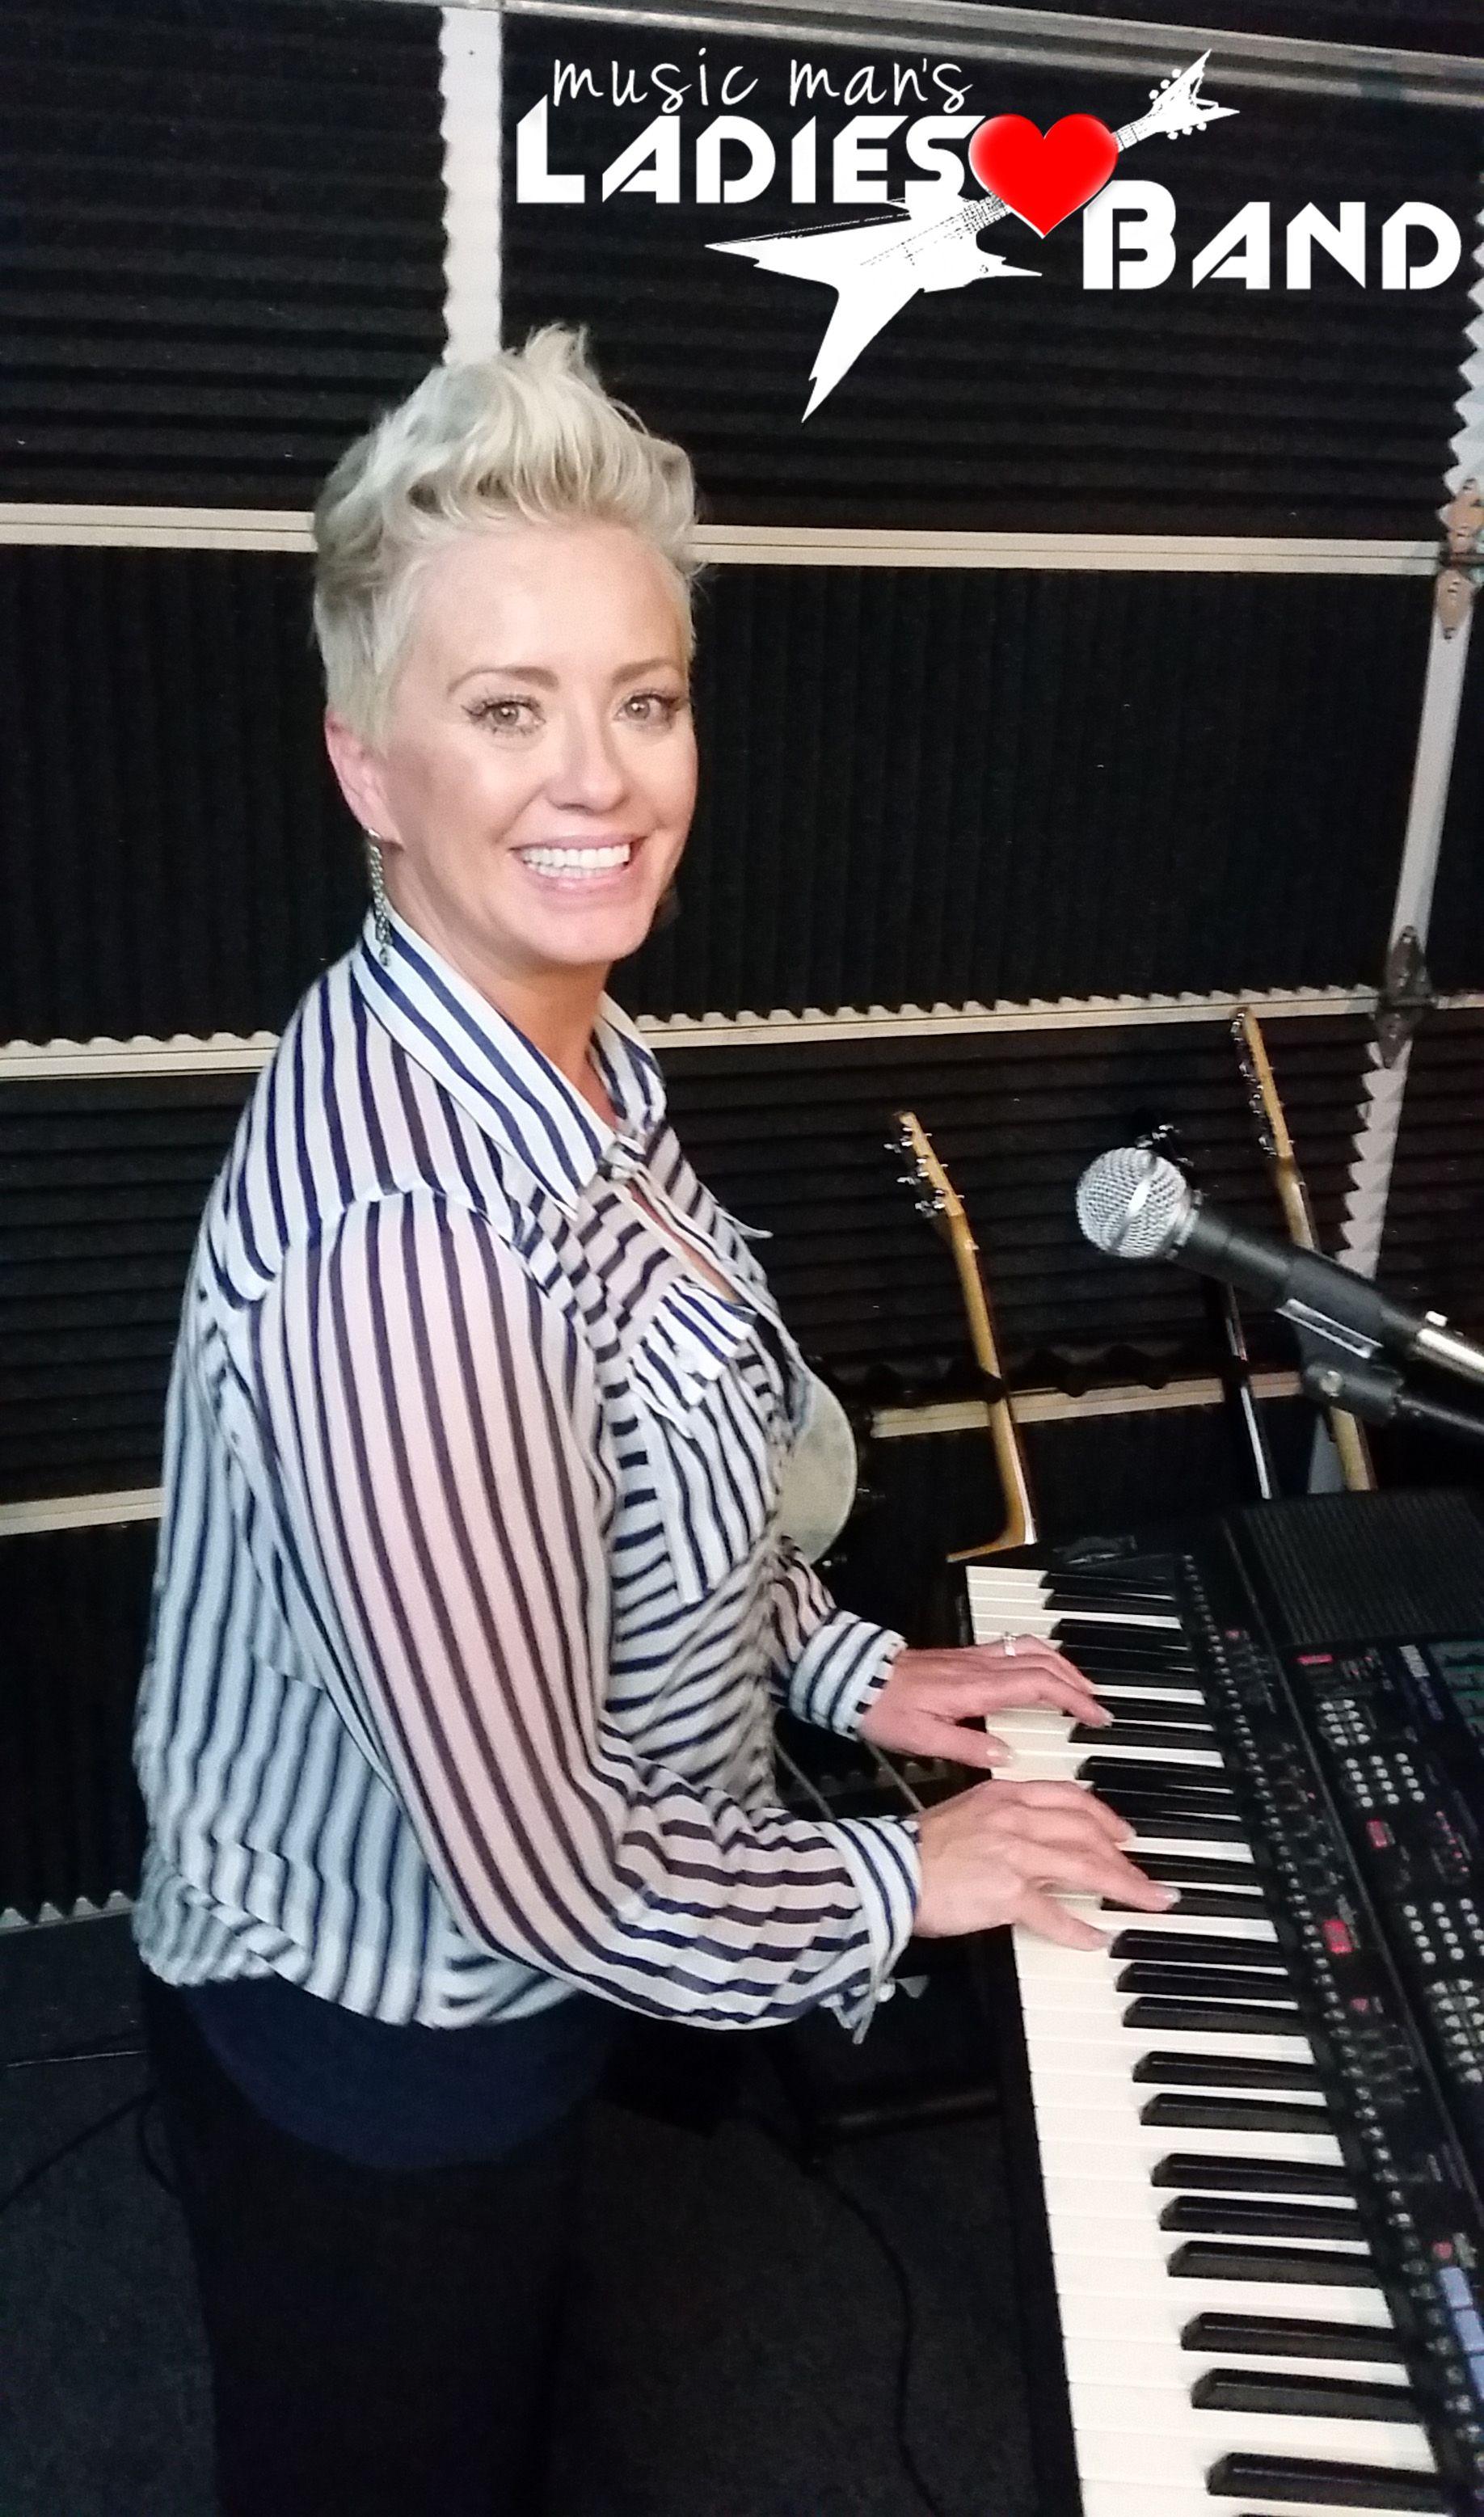 Ericka keyboard ladiesband (With